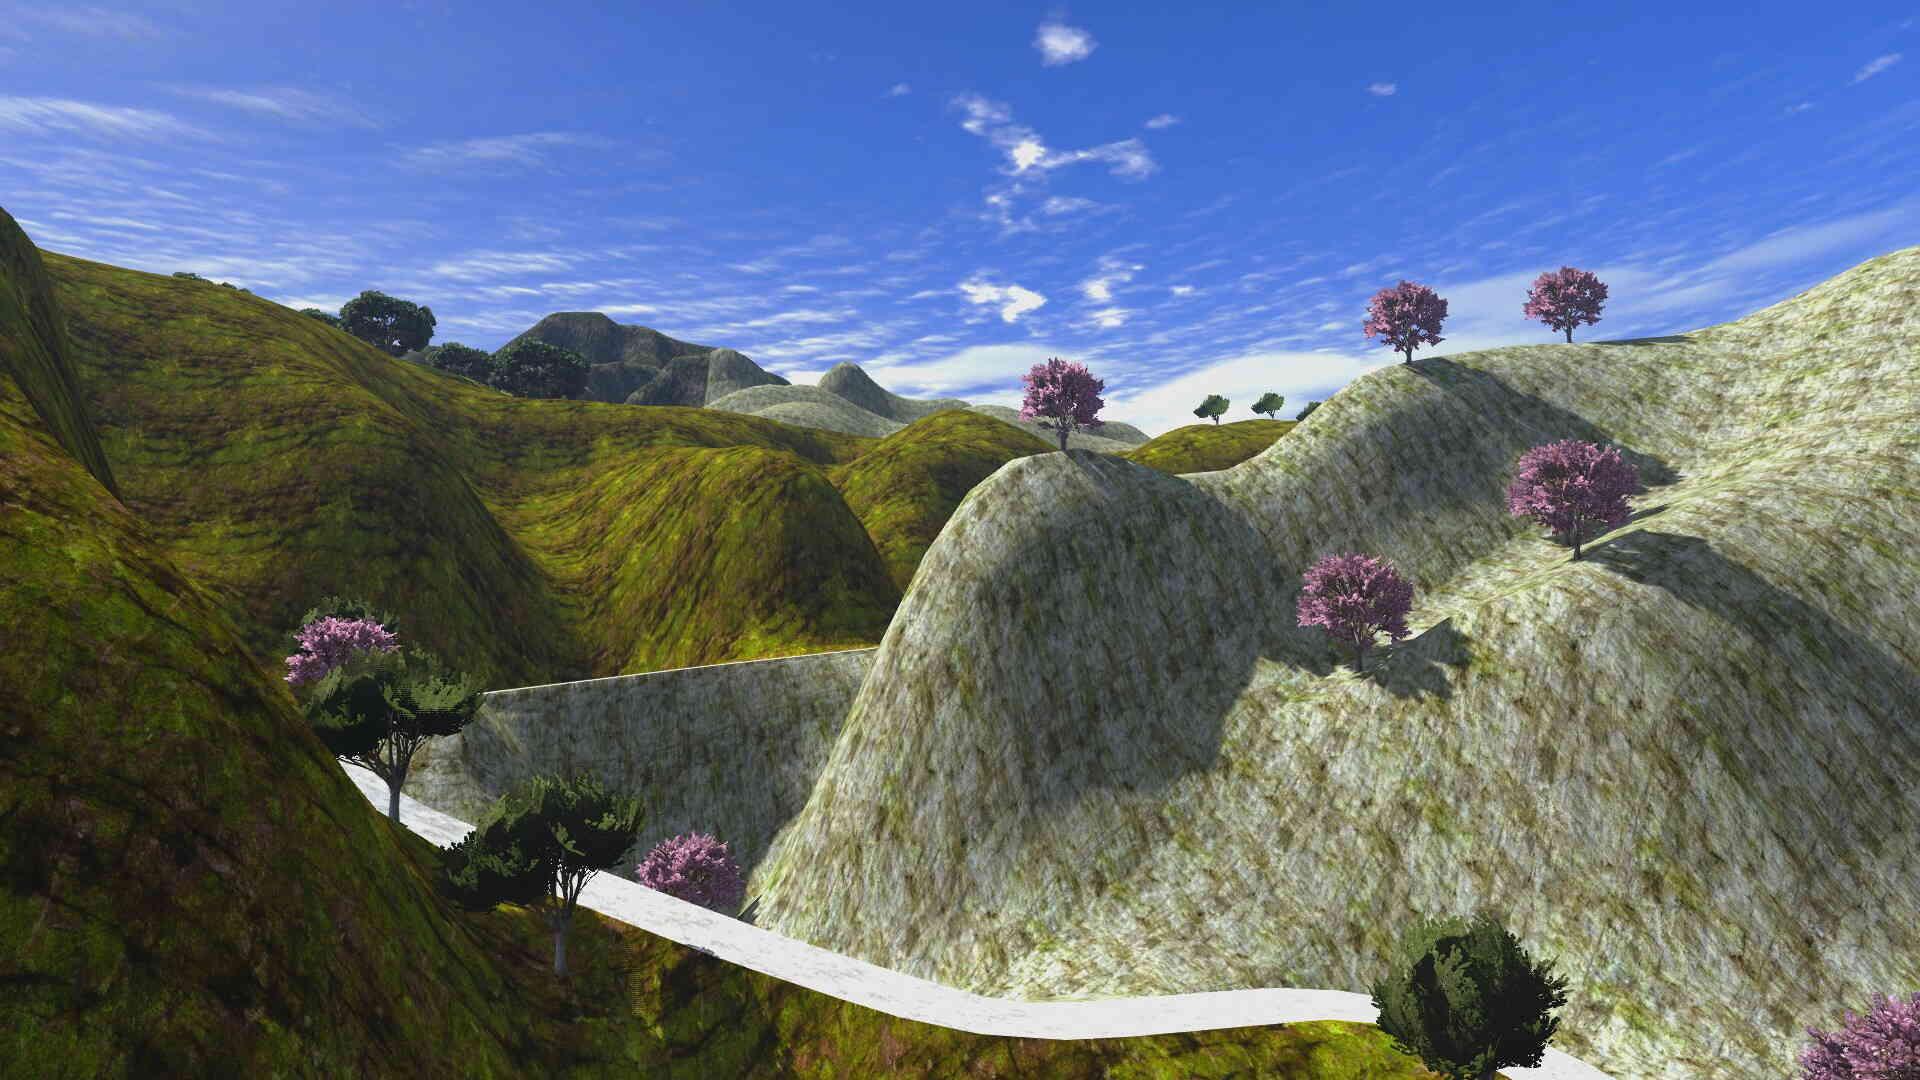 Driver's Paradise [Add-On | Map Editor | Menyoo] - GTA5-Mods com